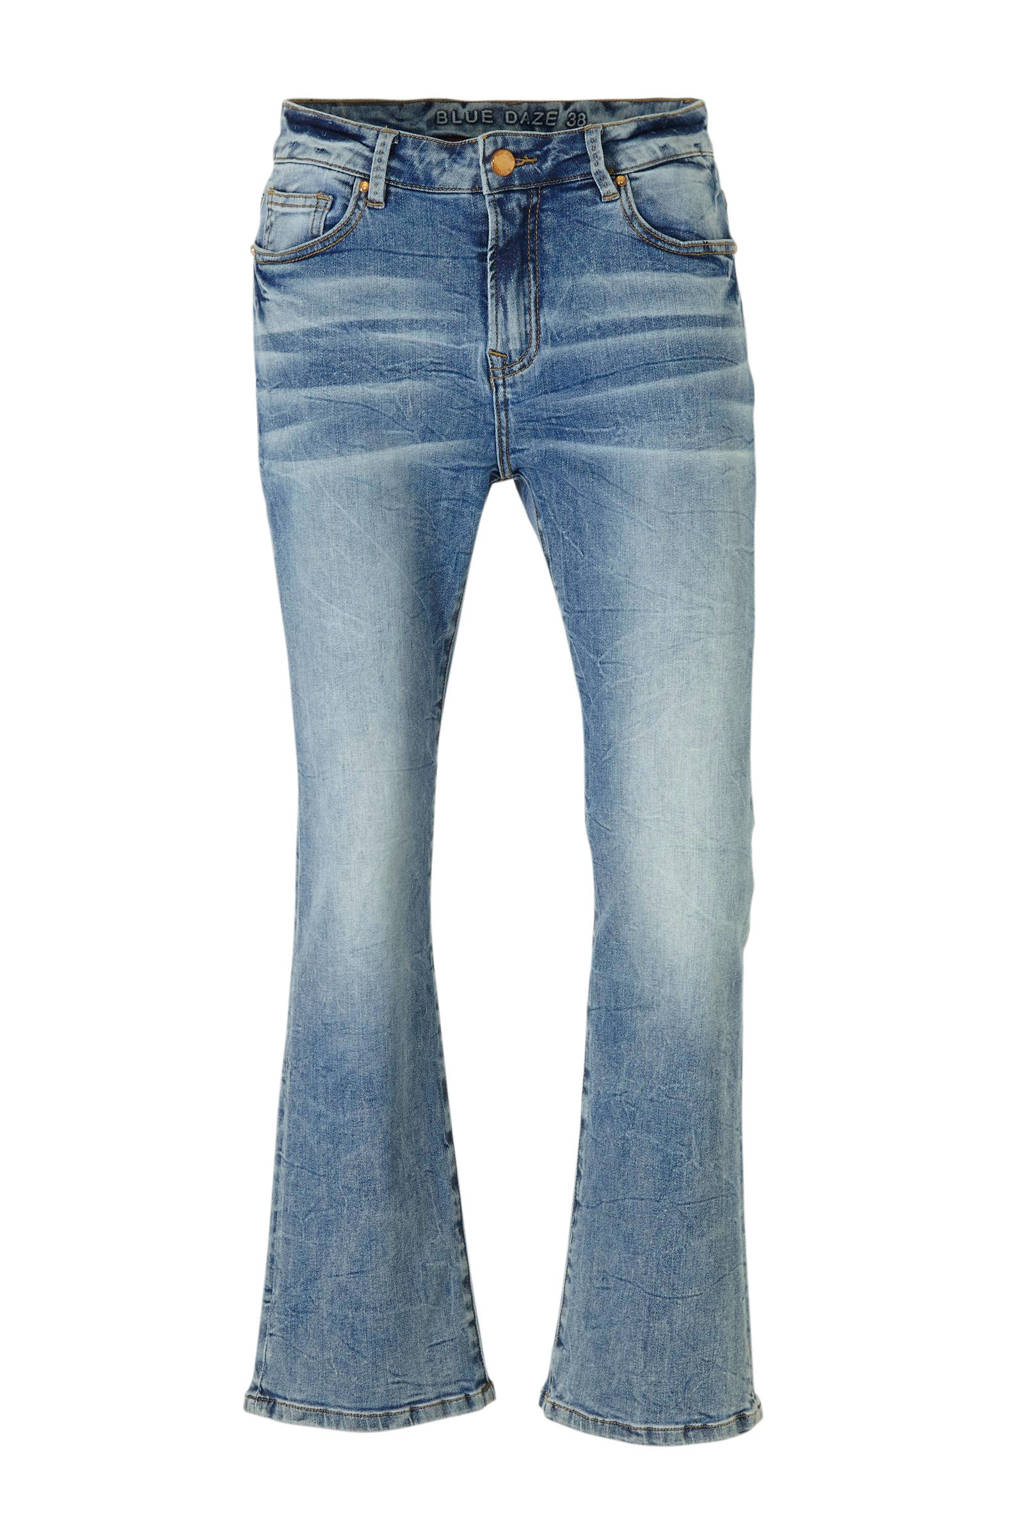 Summum Woman flared jeans blauw, Blauw